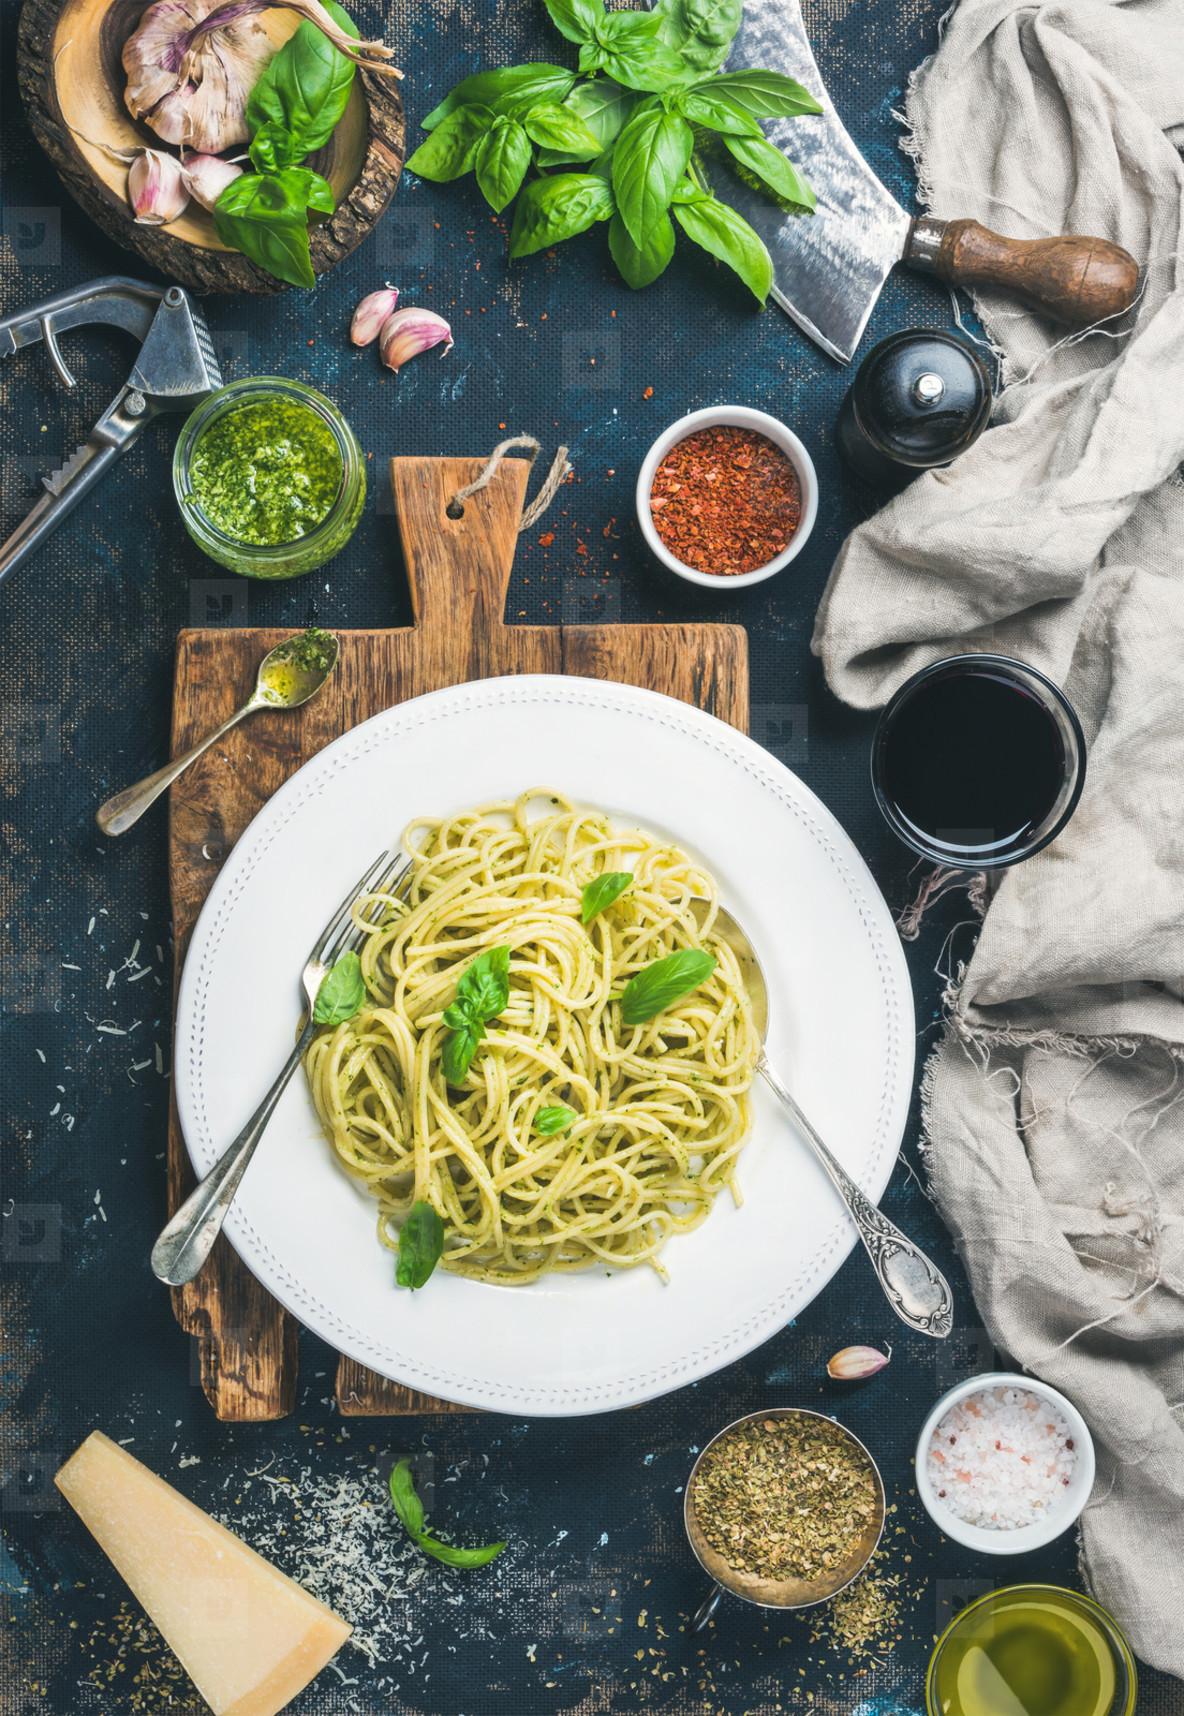 Spaghetti with pesto sauce  parmesan cheese  basil and wine